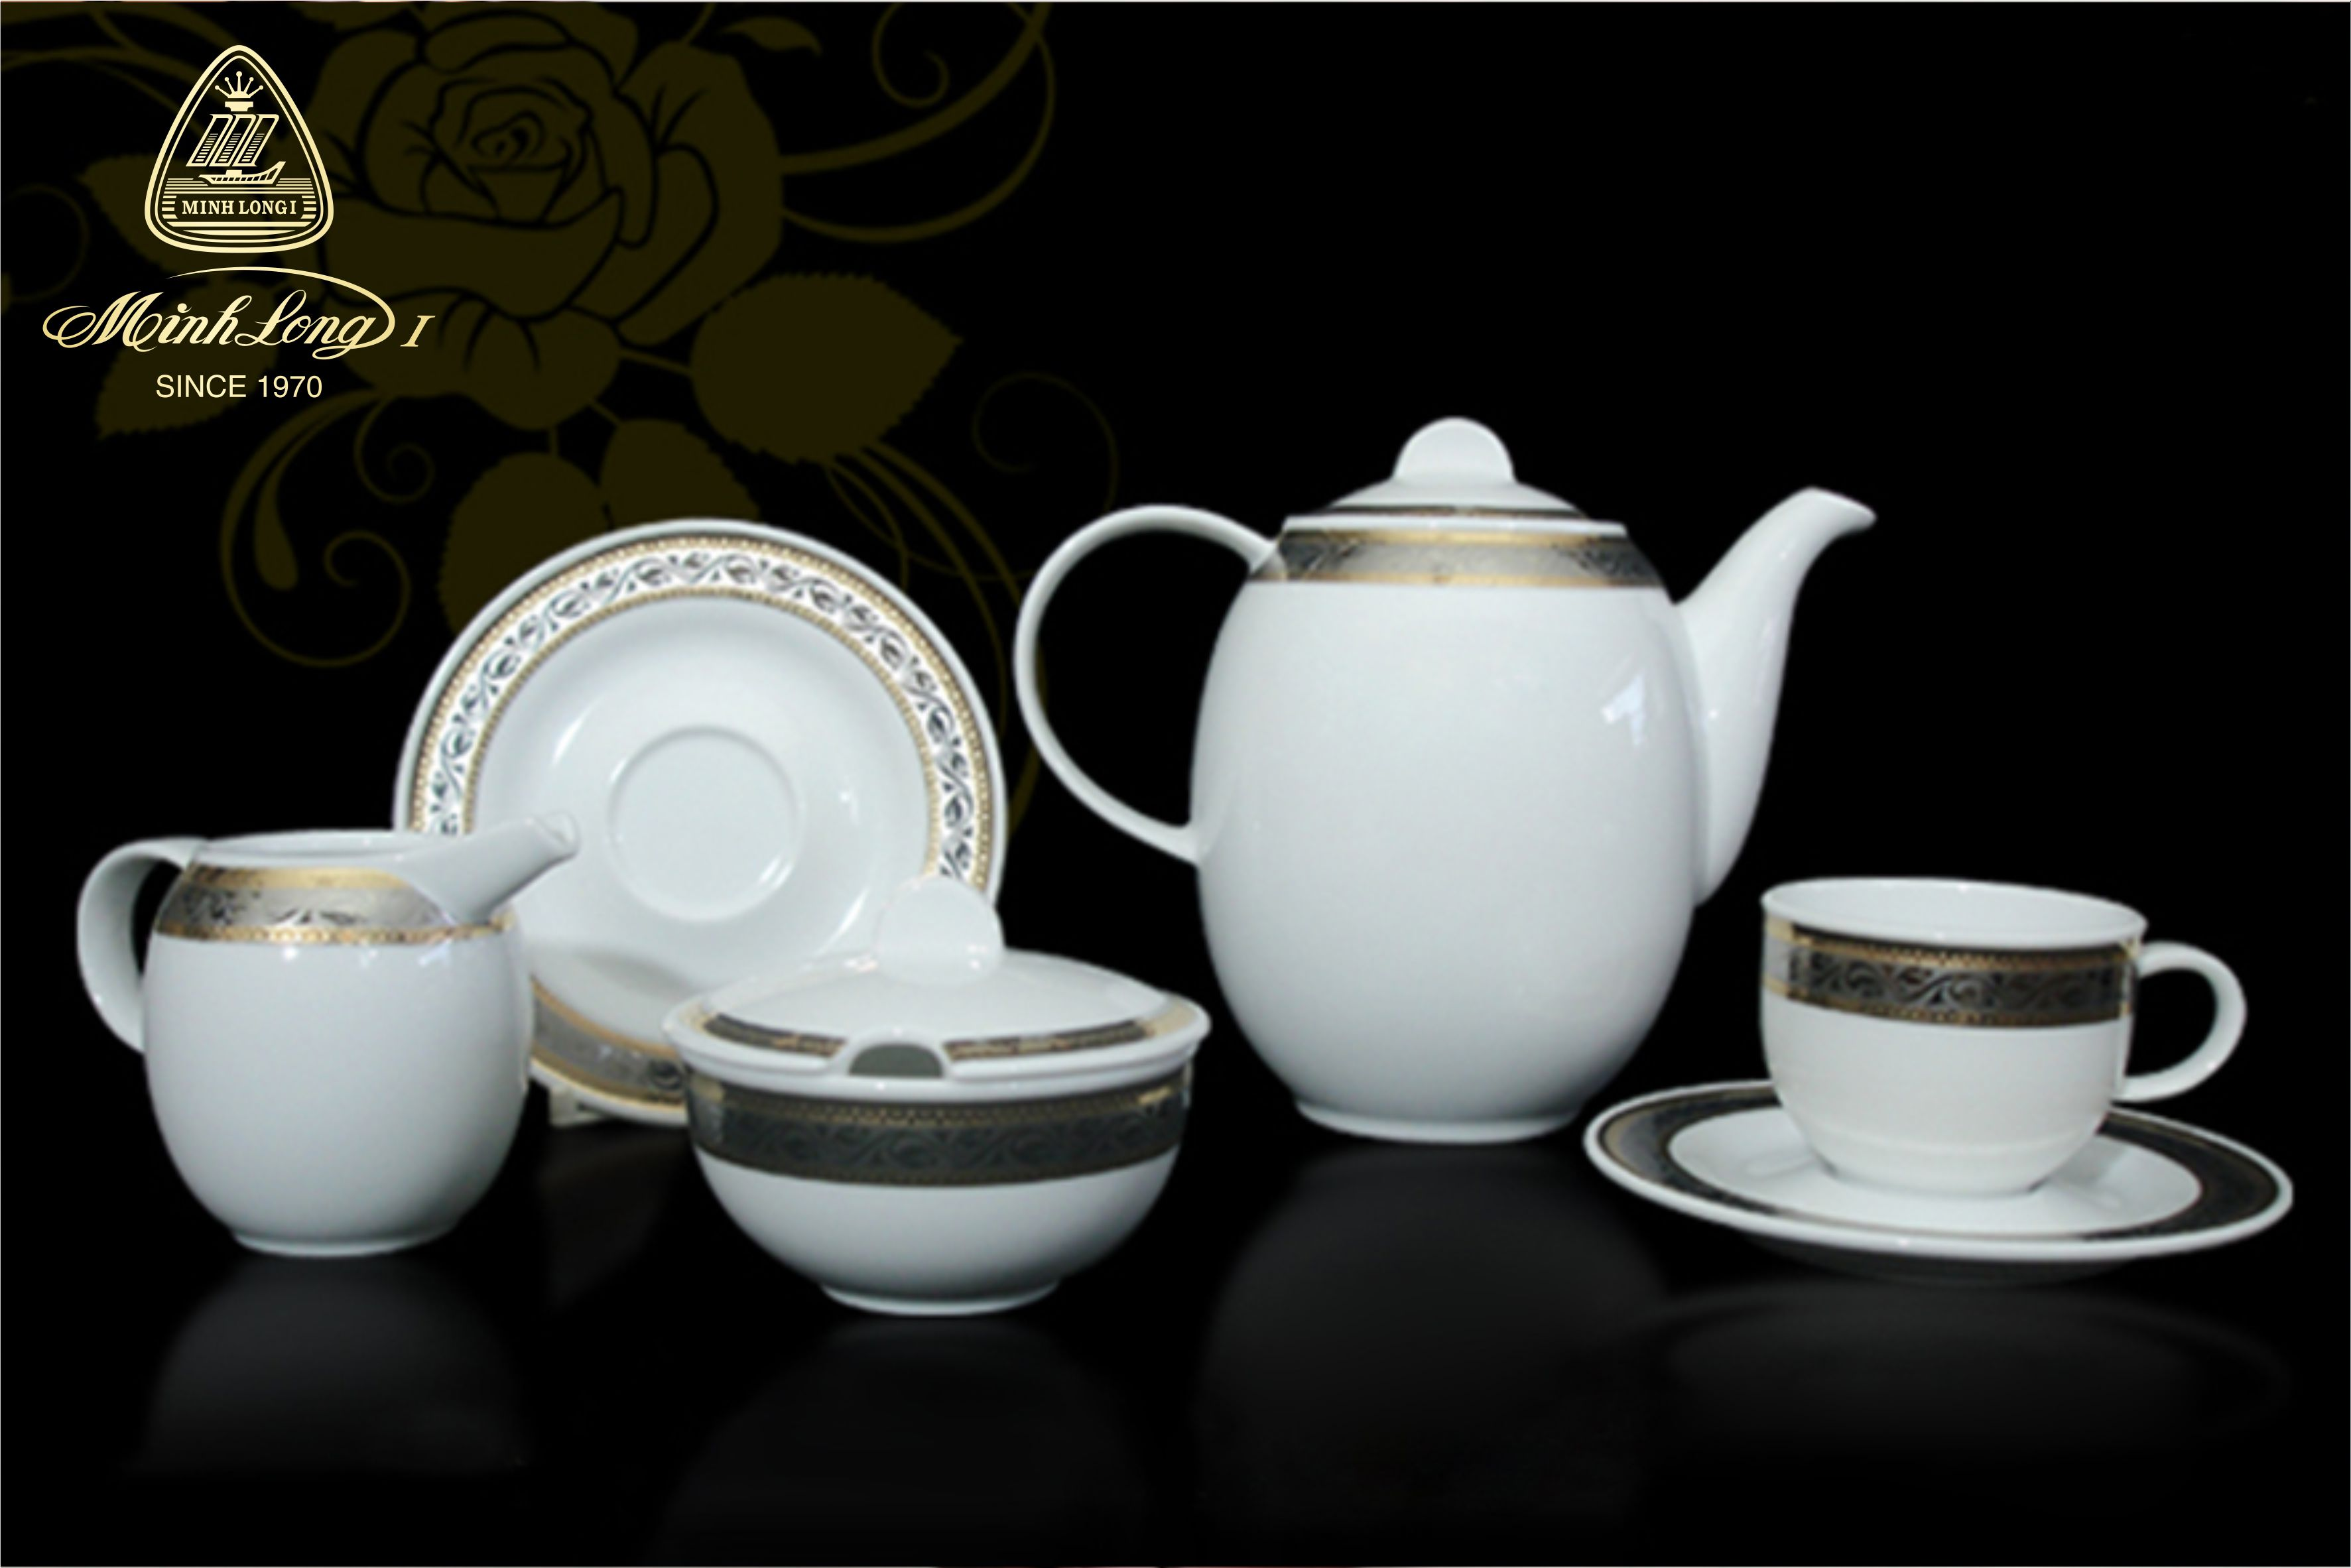 Bộ cà phê 1.3L Sago Hoa Hồng 01130101703 Minh Long